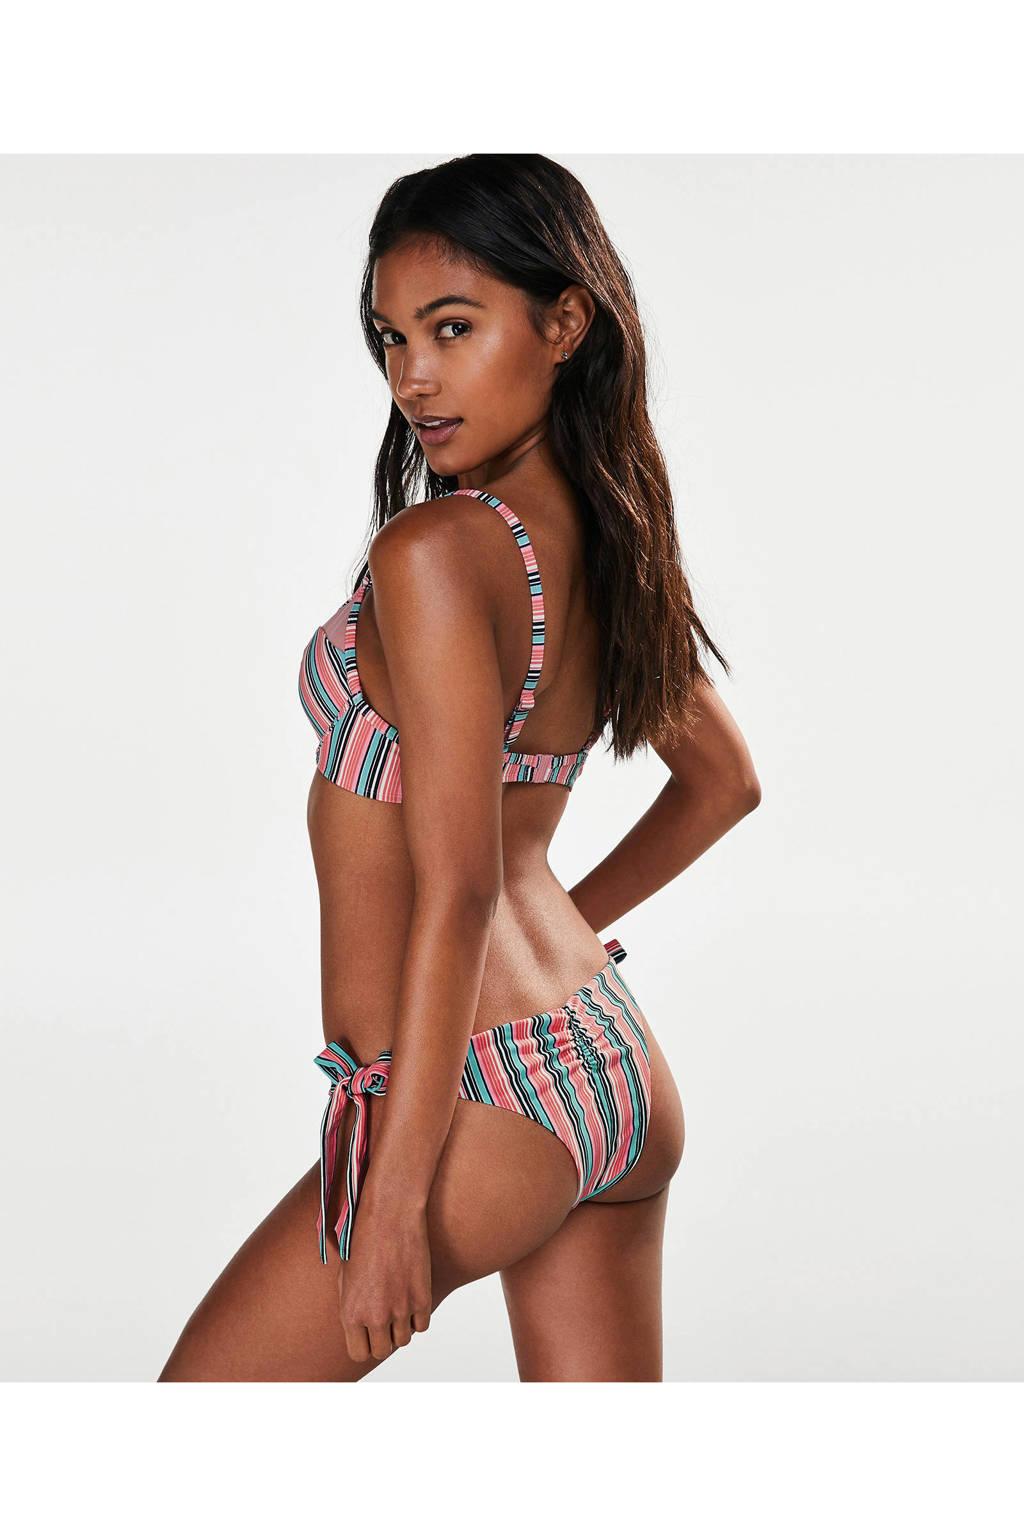 Met Bikinitop Hunkemöllerbeugel All Over Roze Print qx4FaAwxT